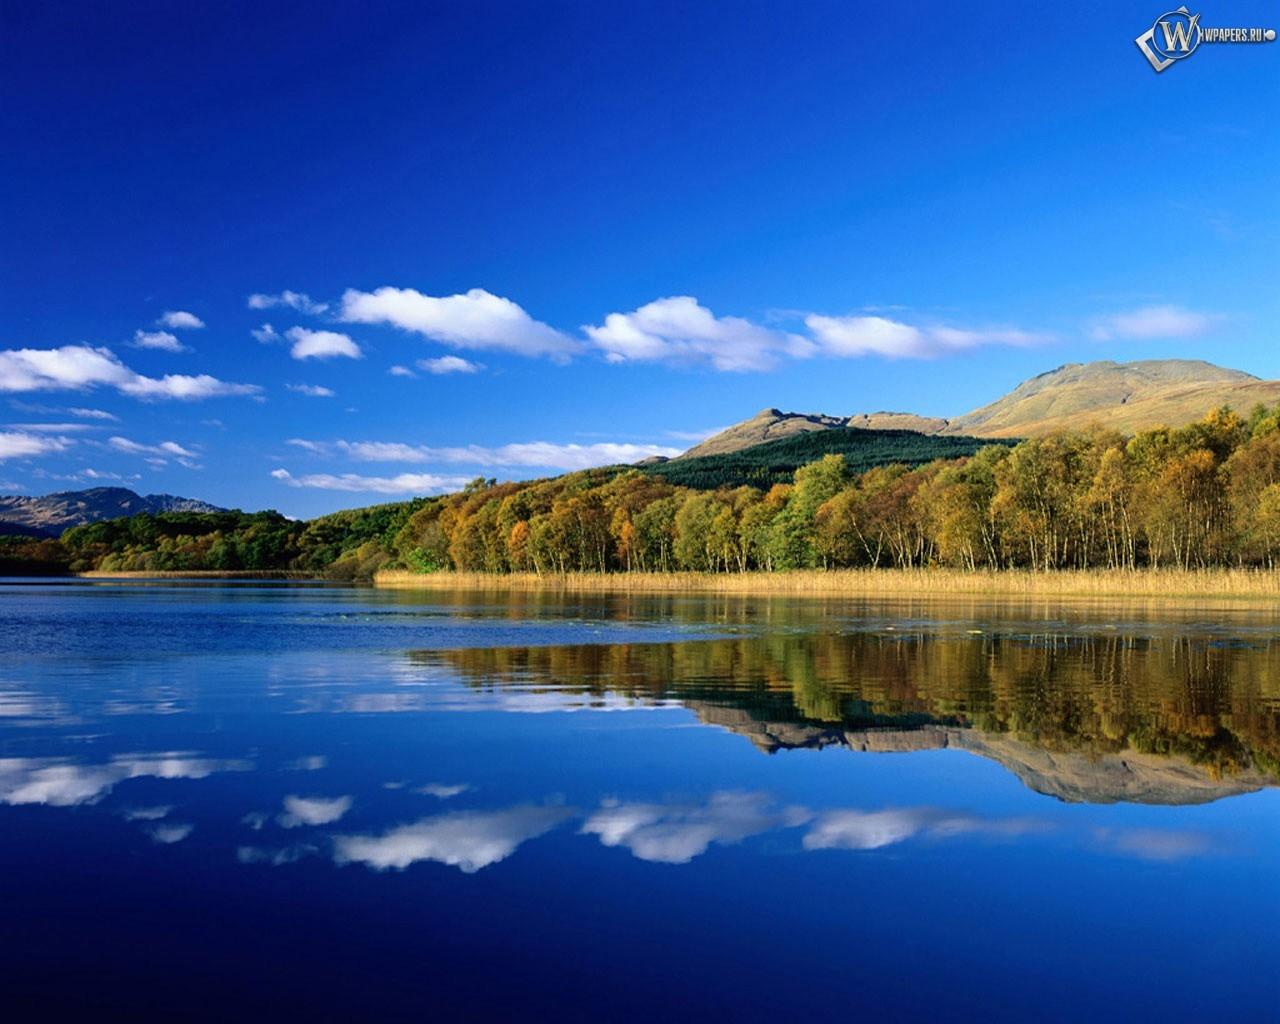 Голубое озеро 1280x1024